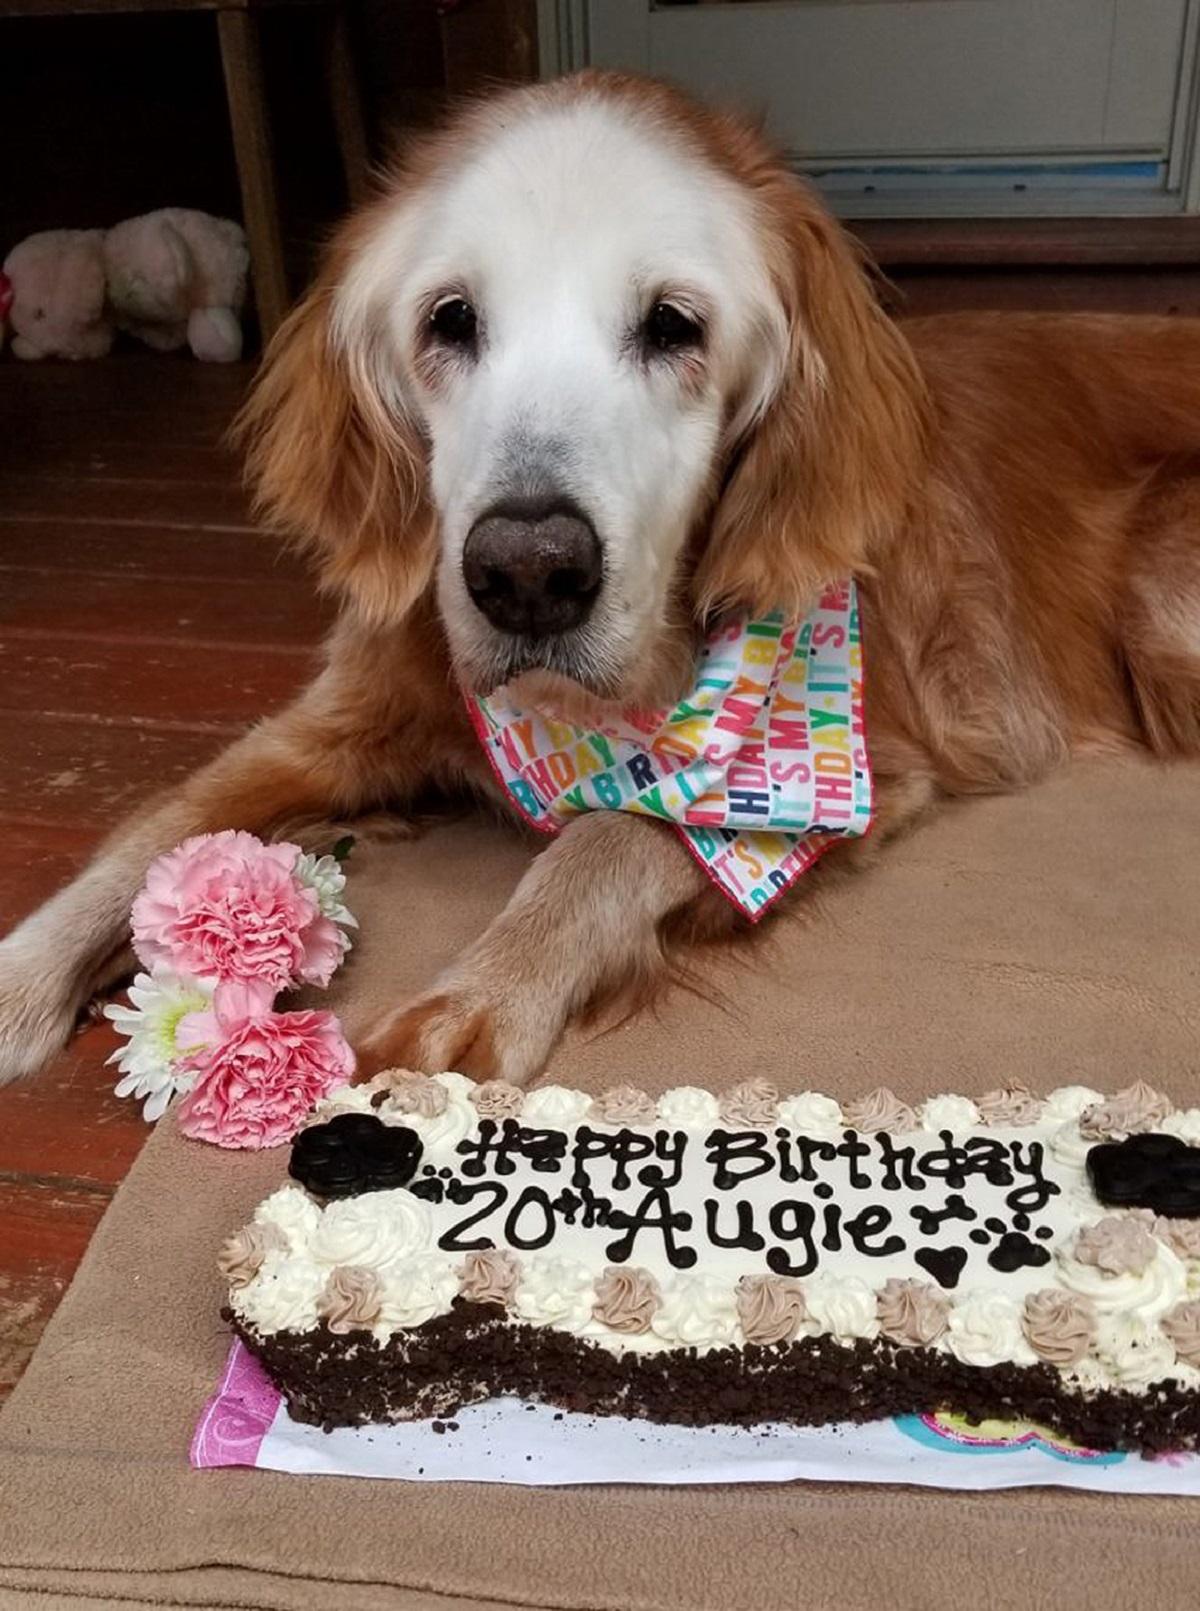 Cane festeggia 20 anni